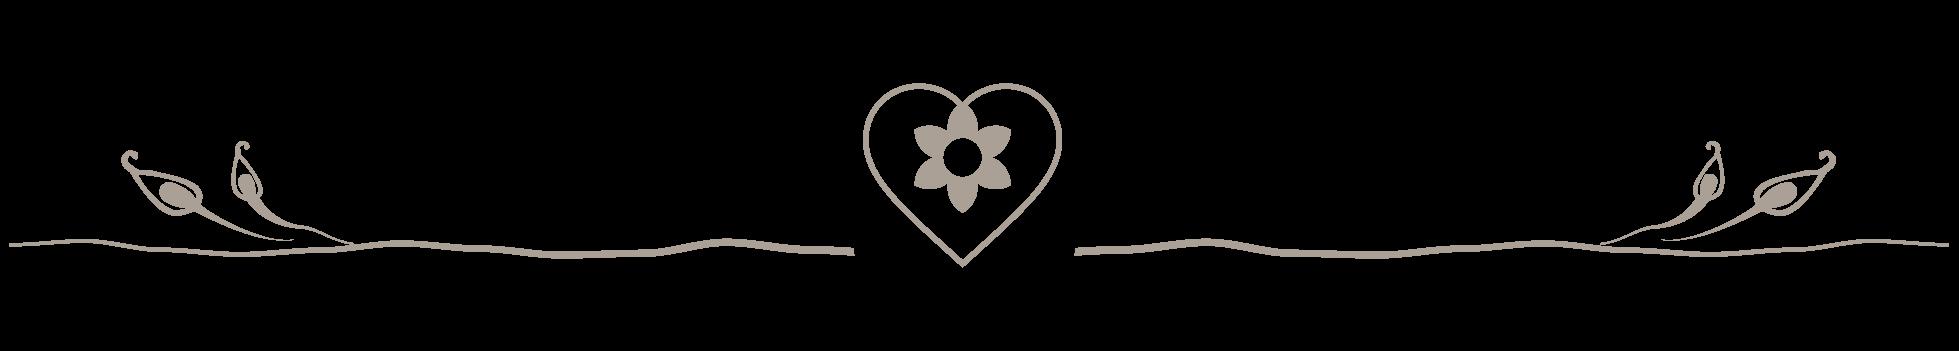 banner_separator_Heart.png